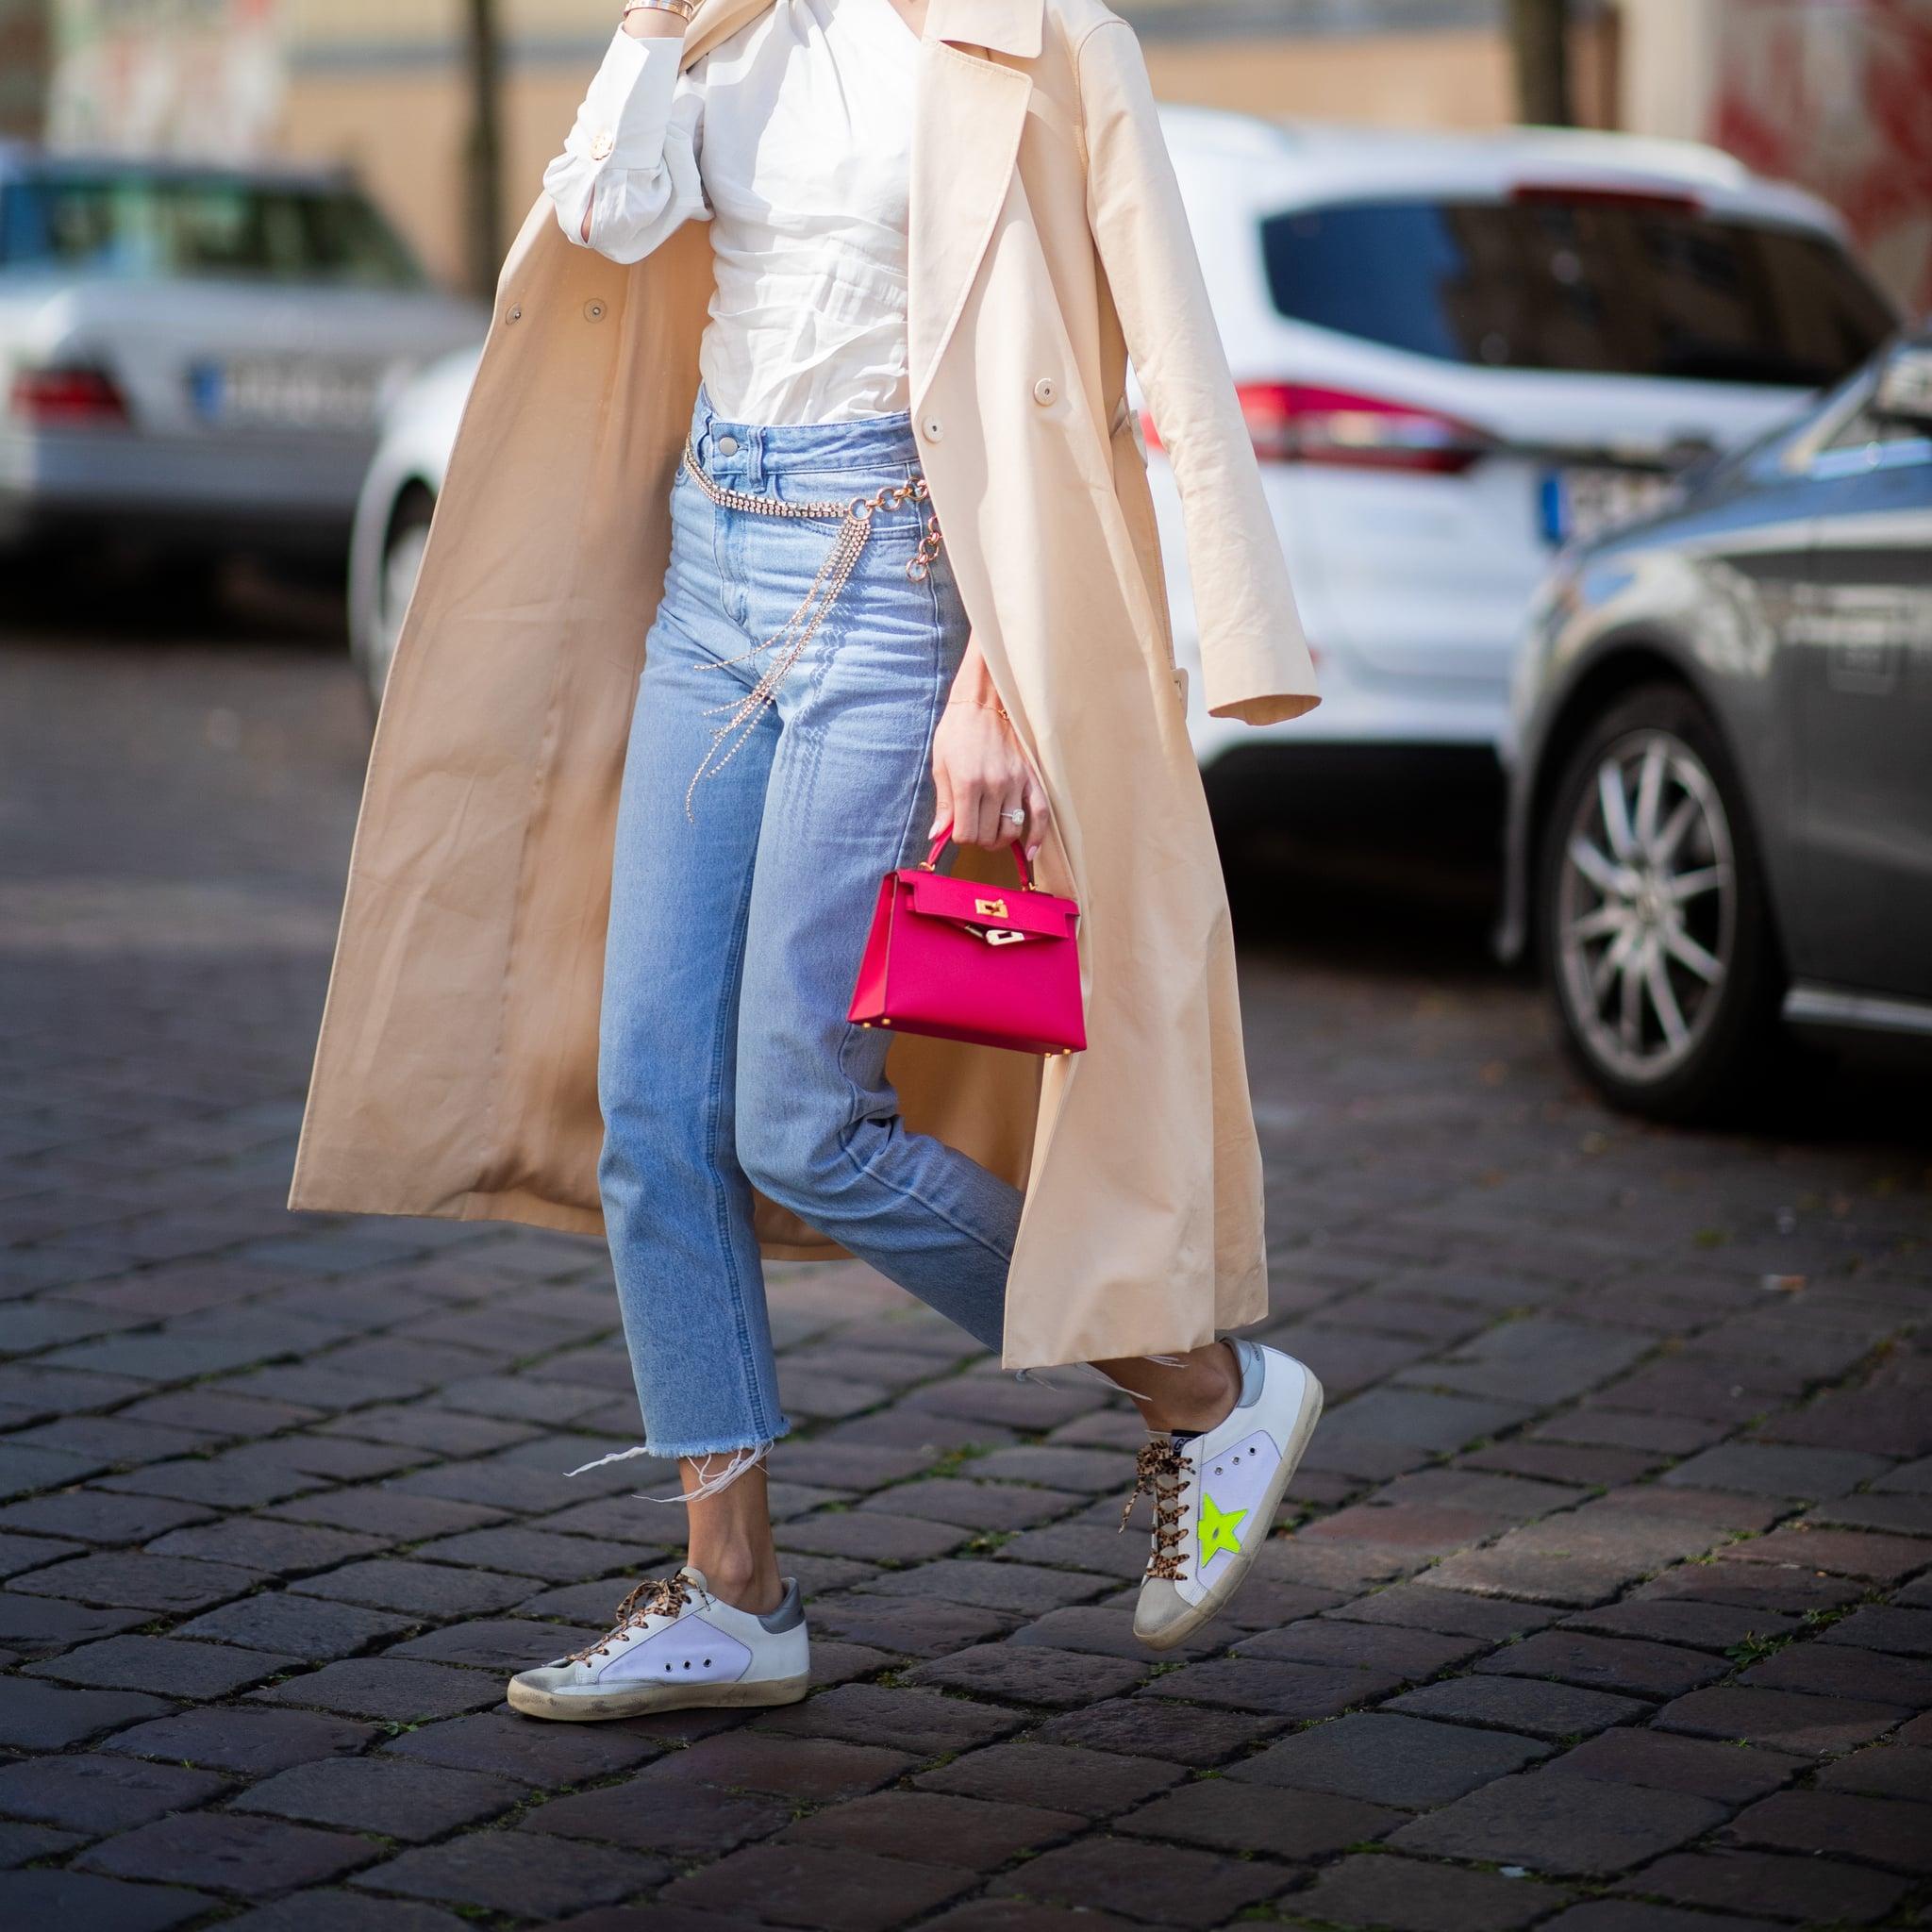 golden goose fashion